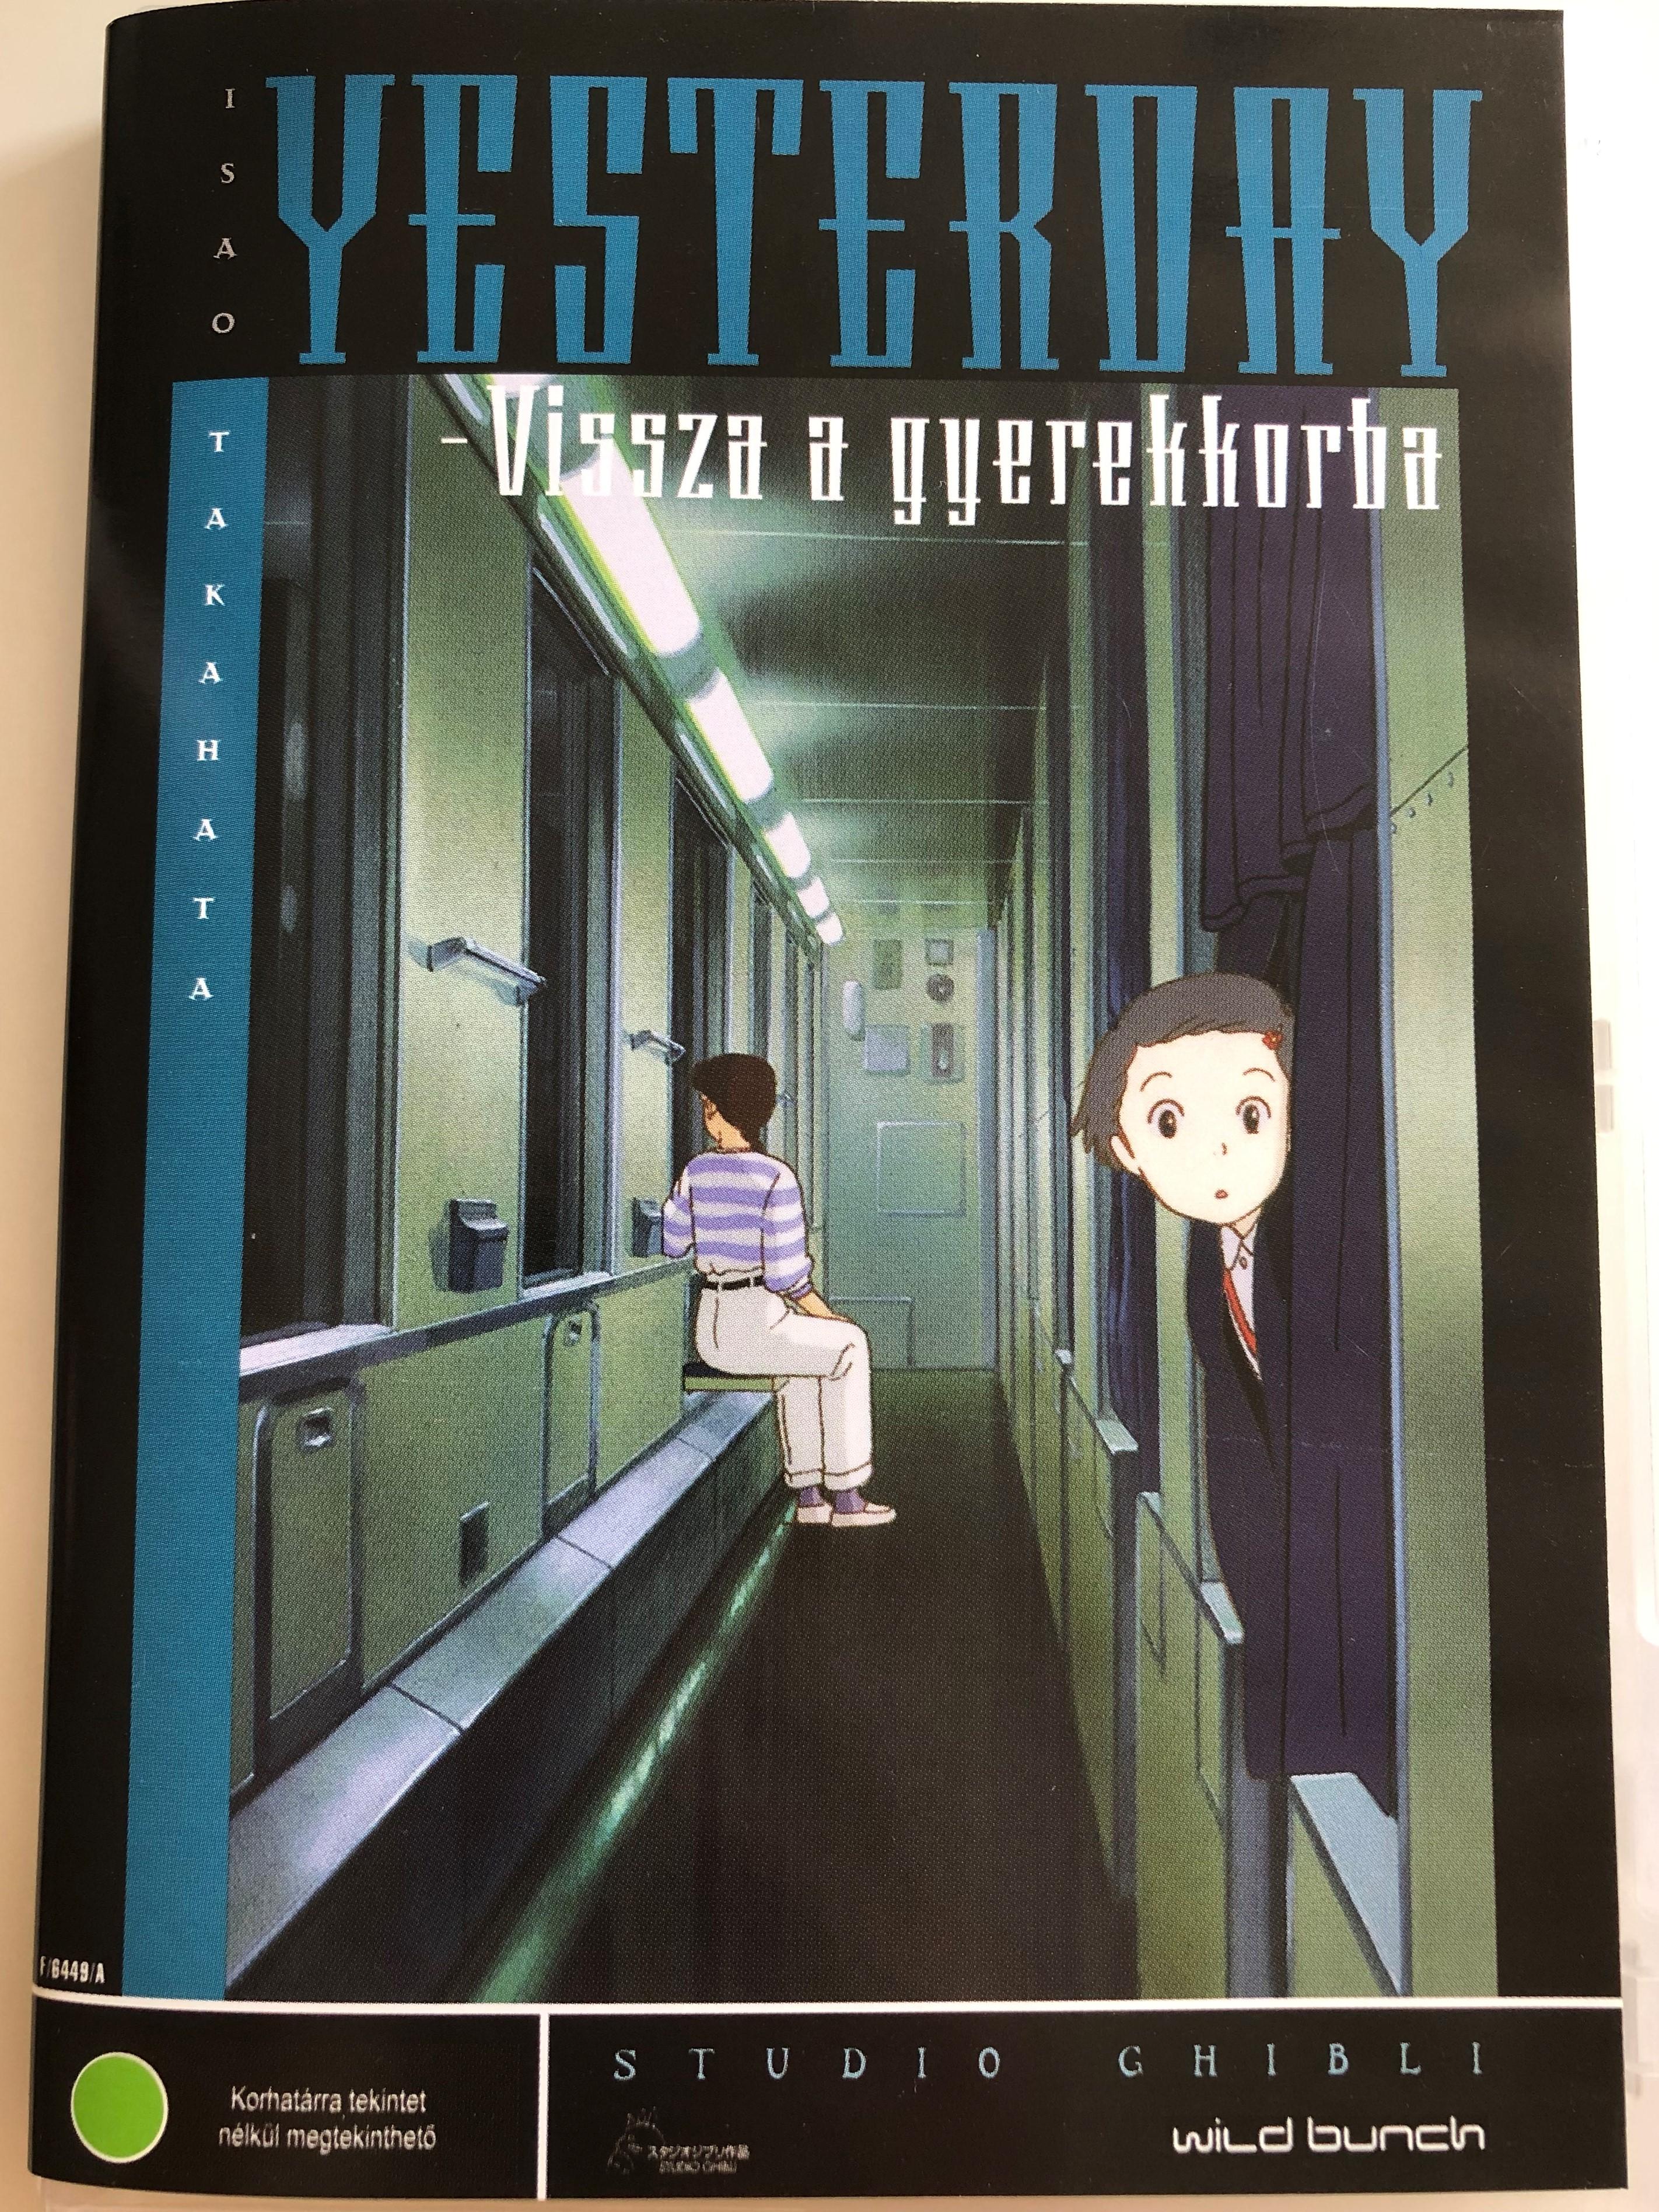 only-yesterday-dvd-1991-yesterday-vissza-a-gyerekkorba-directed-by-isao-takahata-starring-miki-imai-toshir-yanagiba-y-ko-honna-studio-ghibli-japanese-animated-film-omoide-poro-poro-1-.jpg